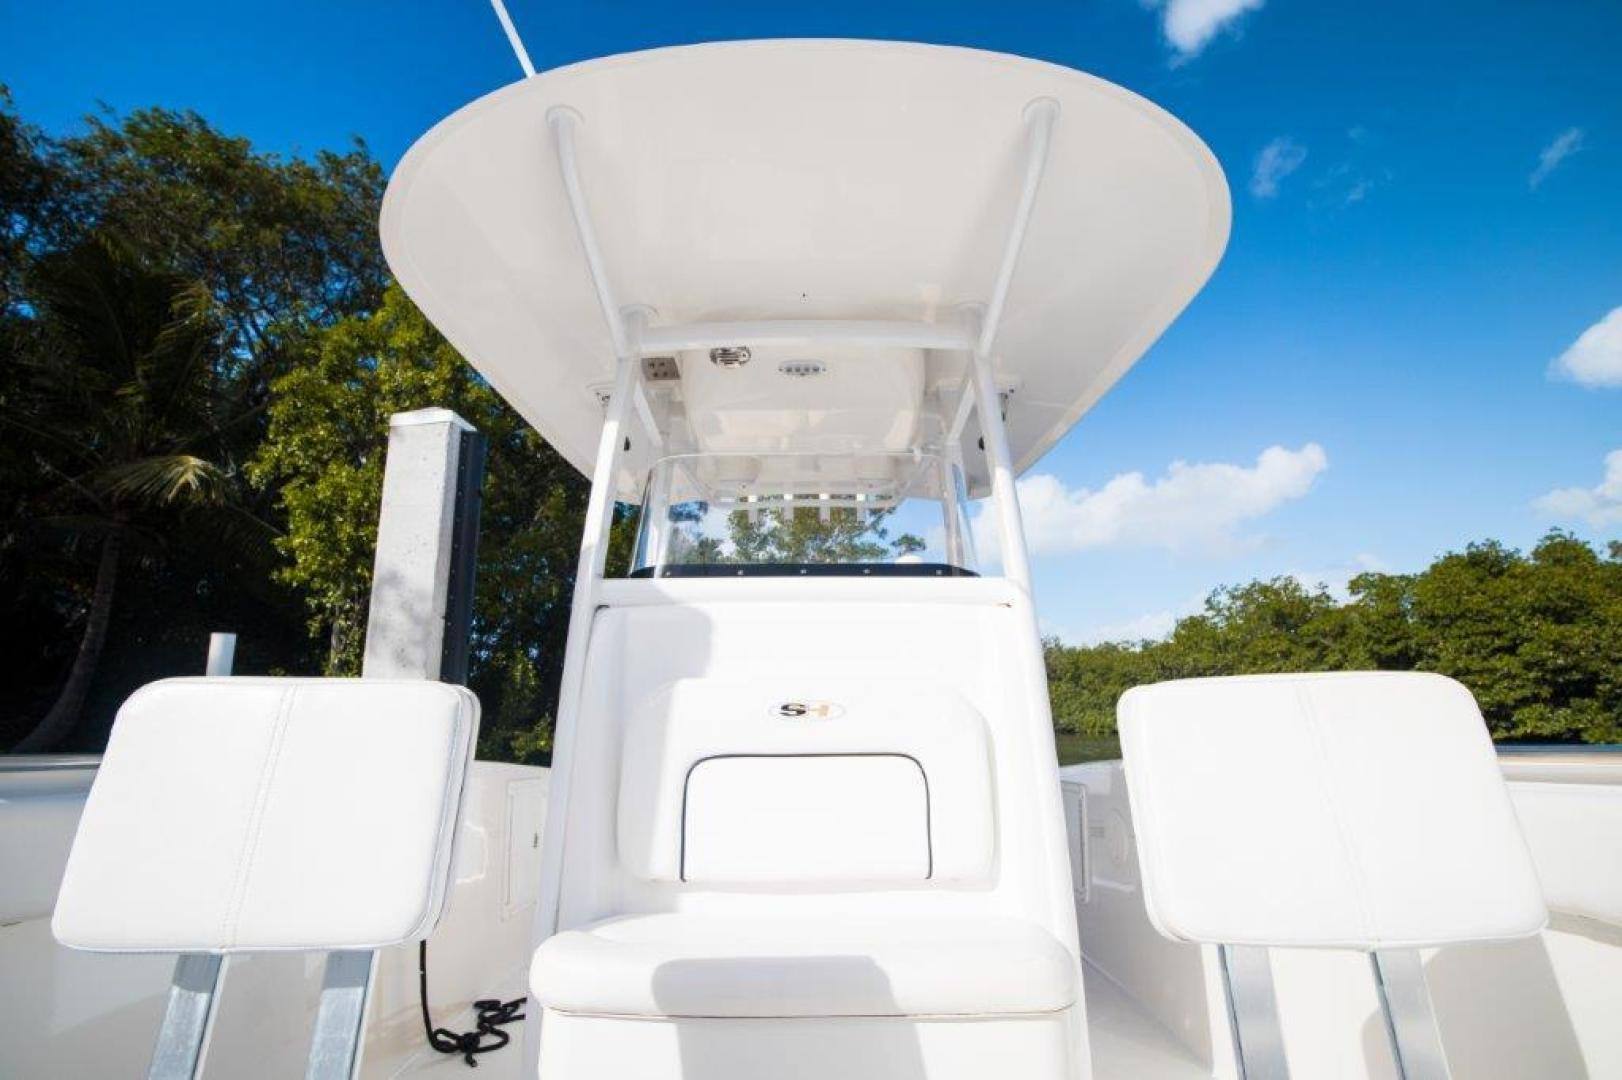 Sea Hunt-Gamefisherman 2013-No Name 29 Sea Hunt Key Largo-Florida-United States-Console Seating-1562267 | Thumbnail